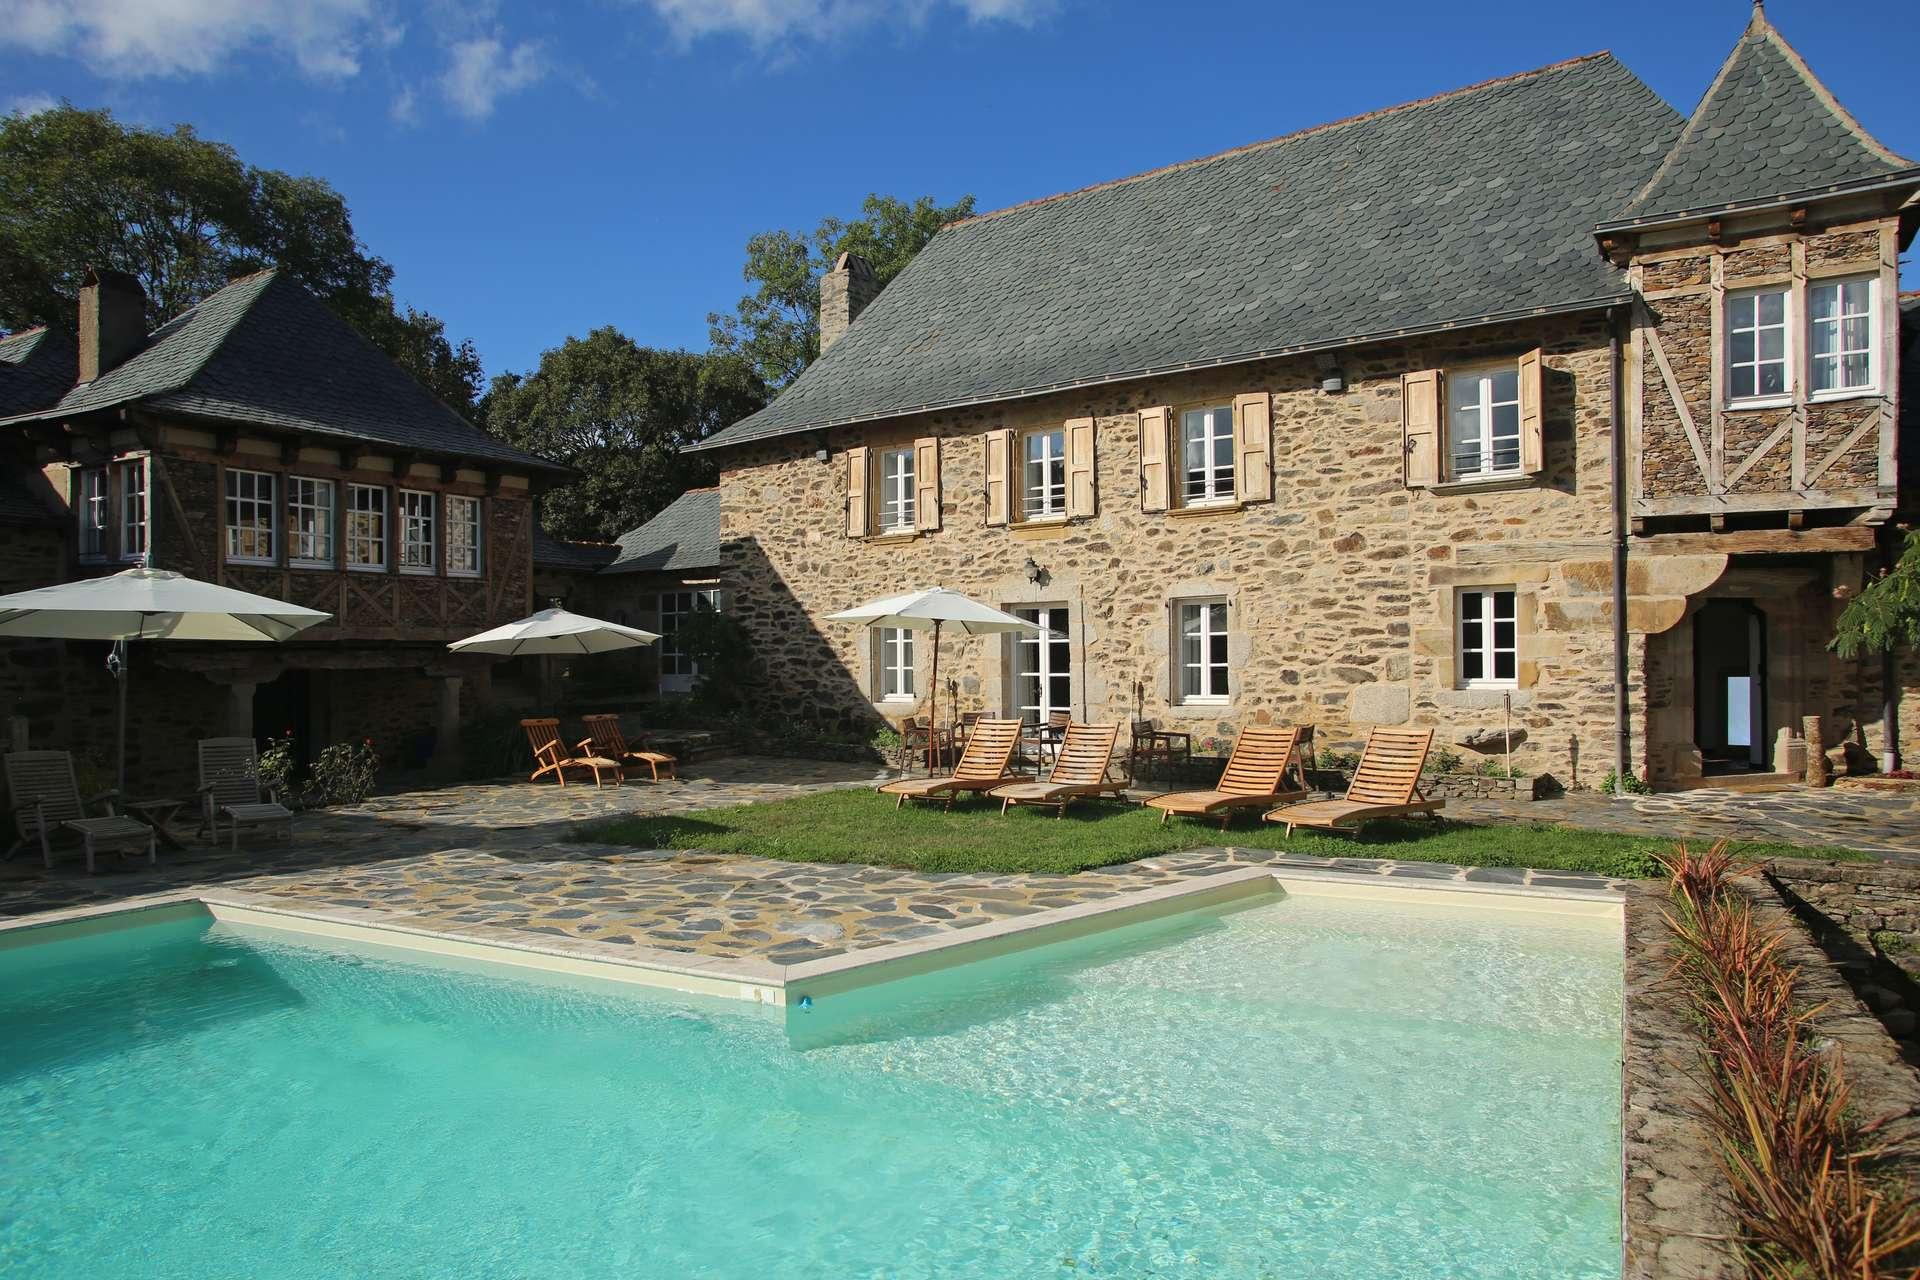 Luxury vacation rentals europe - France - Southwest france - Aveyron - Chateau en Rouergue - Image 1/19